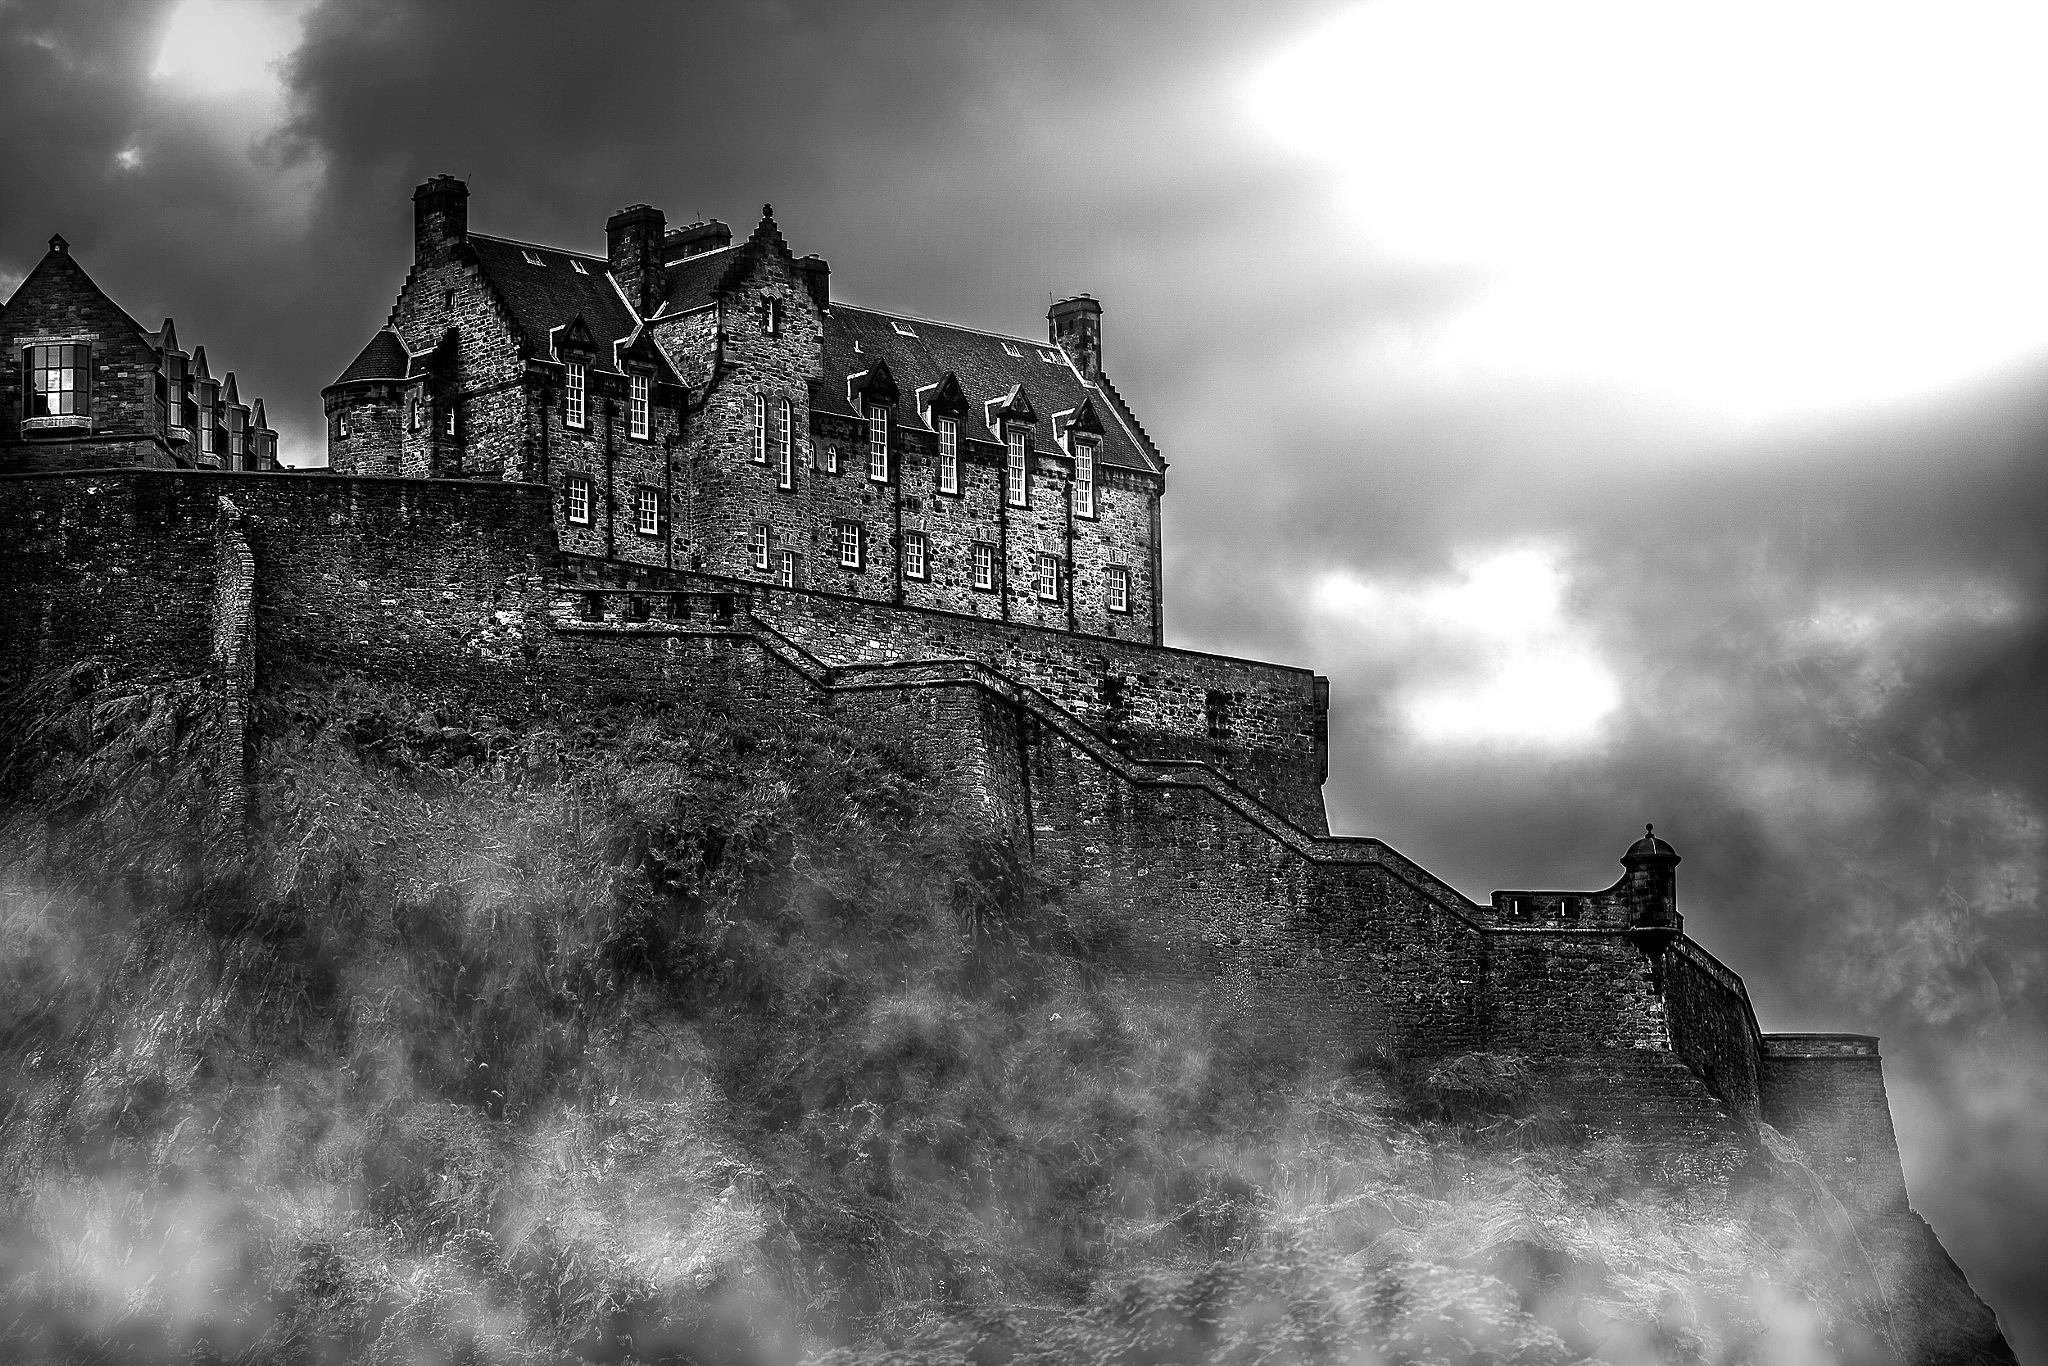 Edinburgh Castle B&W by Peter Schlyter